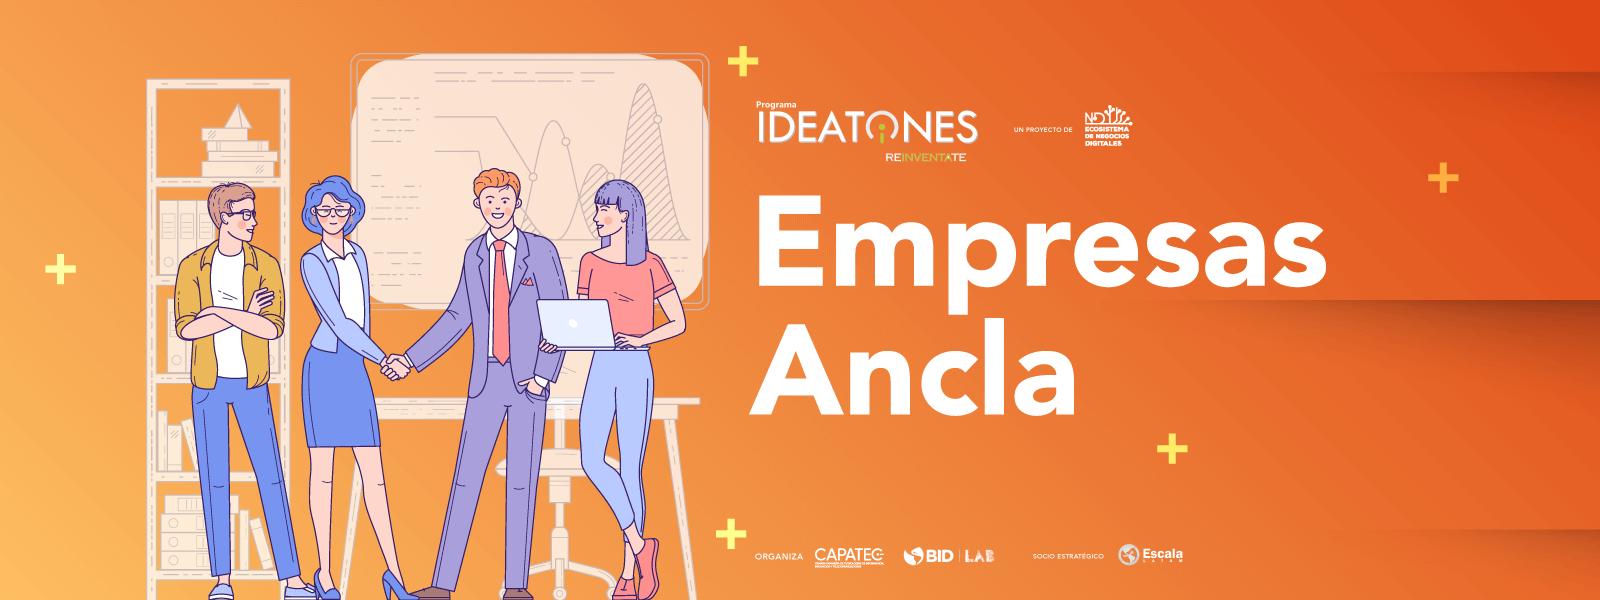 EMPRESAS ANLCA IDEATONES